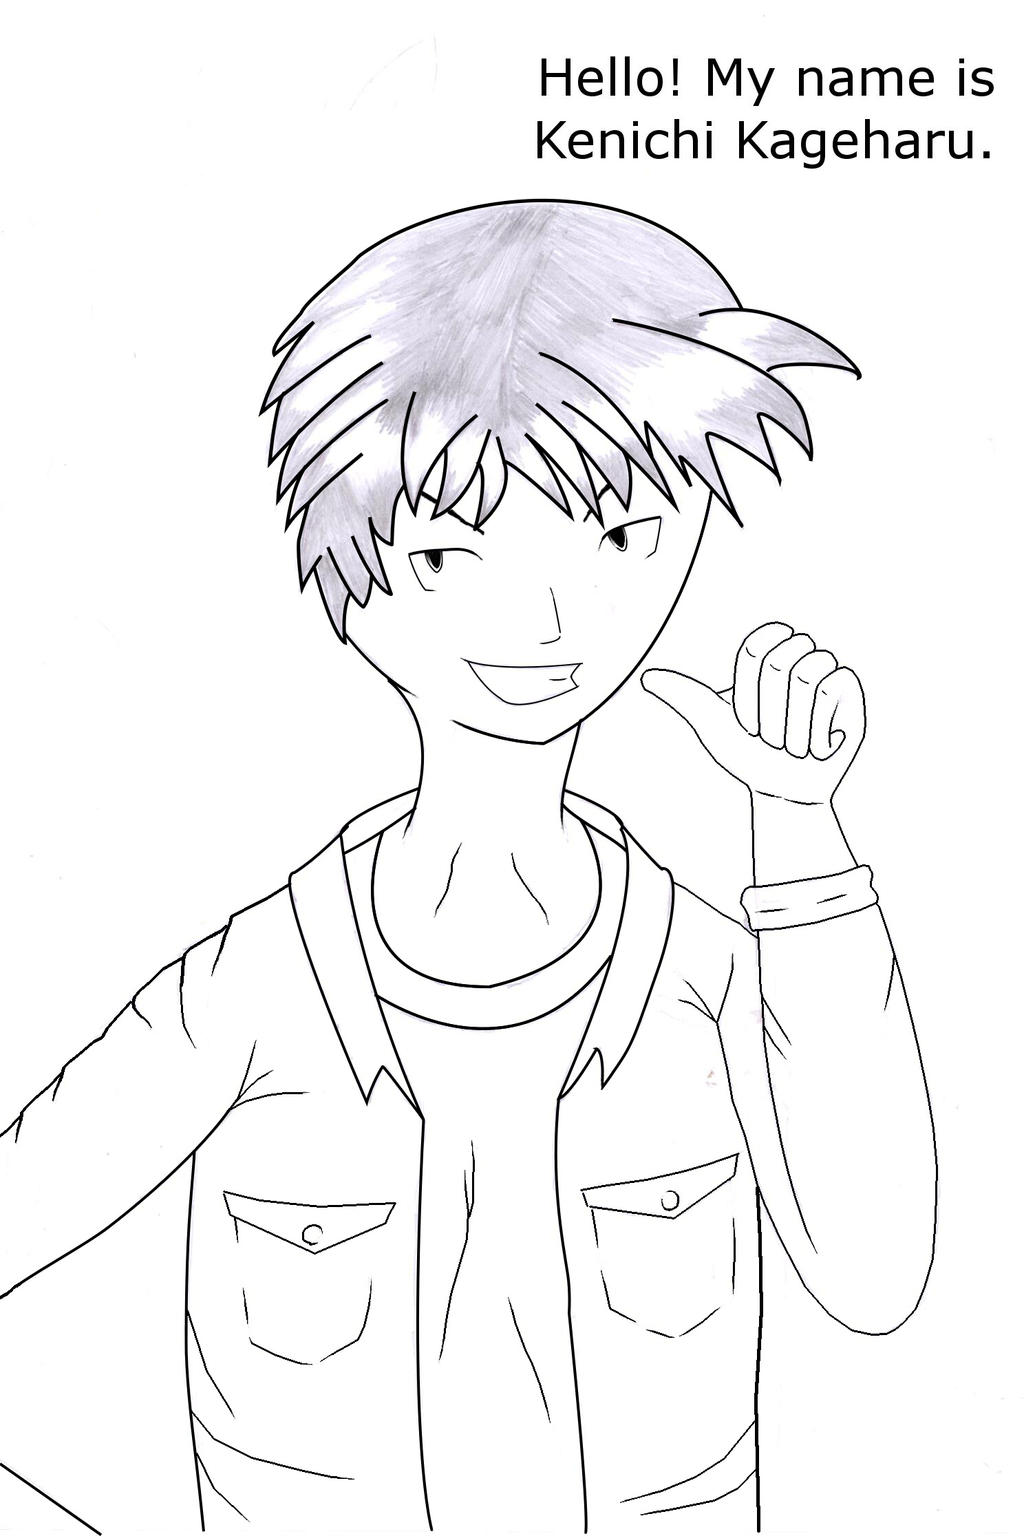 Kenichi-Kageharu's Profile Picture